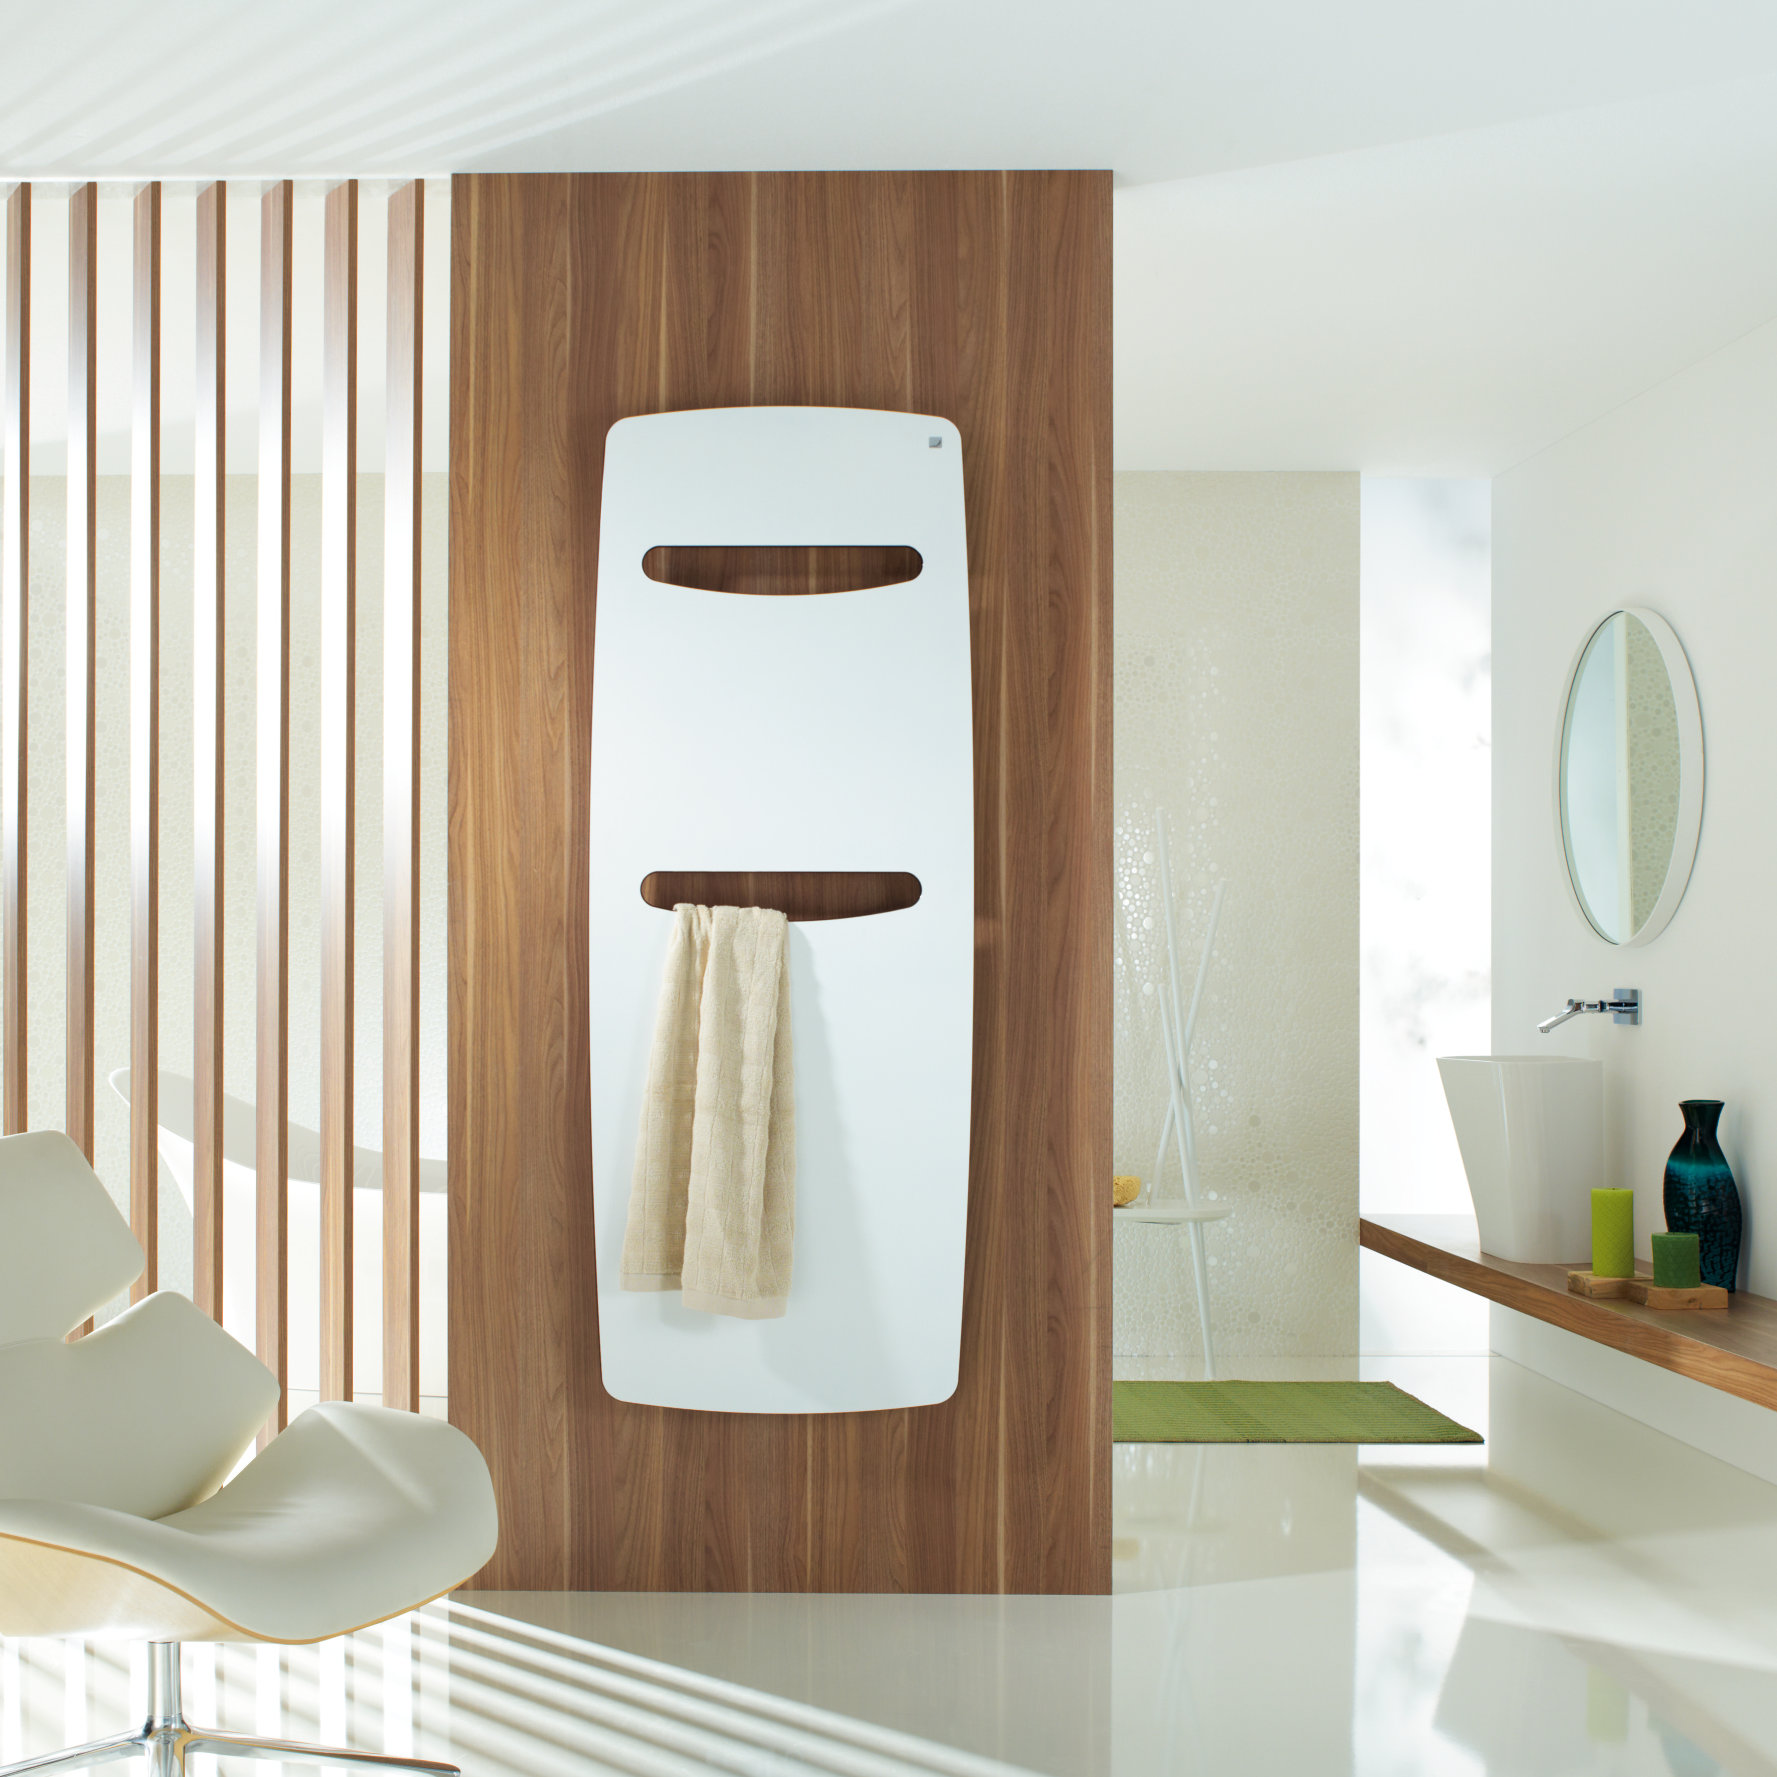 Zehnder Vitalo Spa furdoszobai dizajn radiator 7